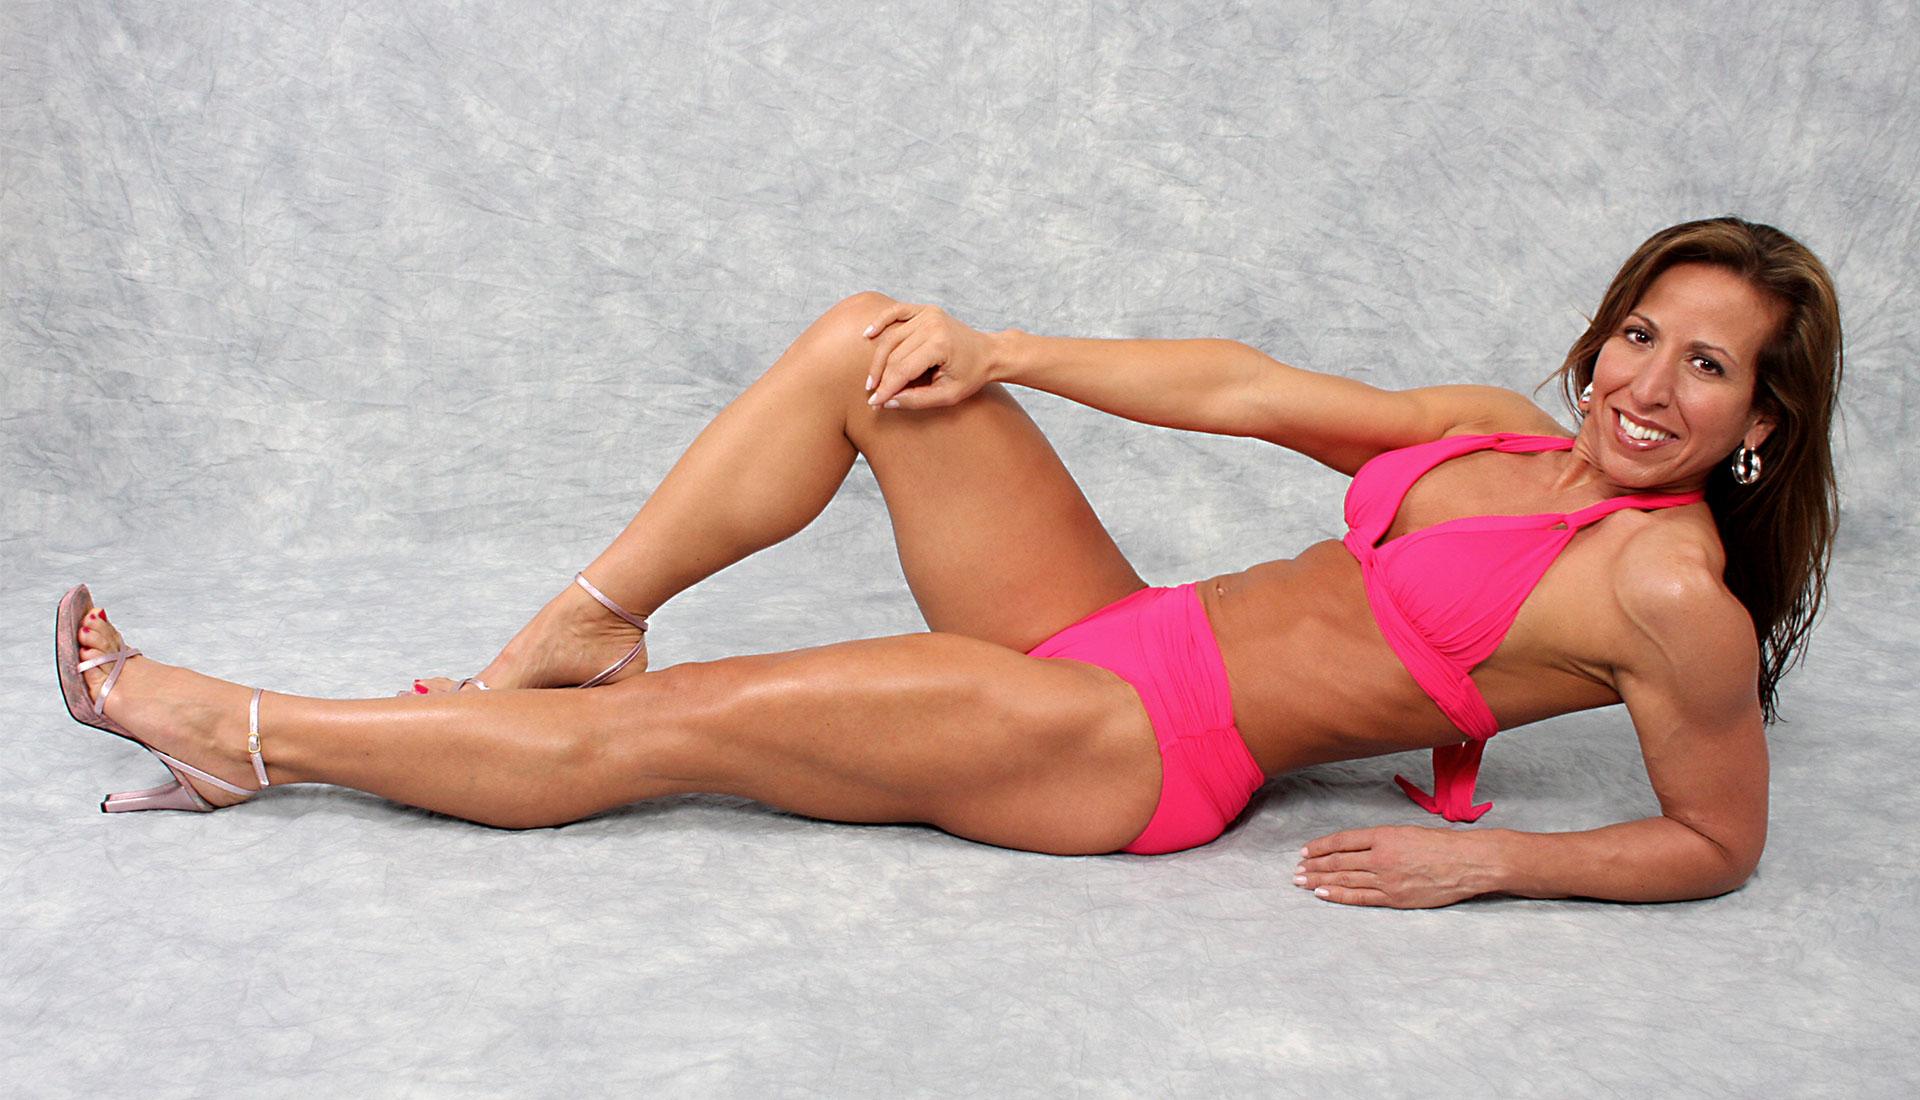 linda-stephens-bikini-shot